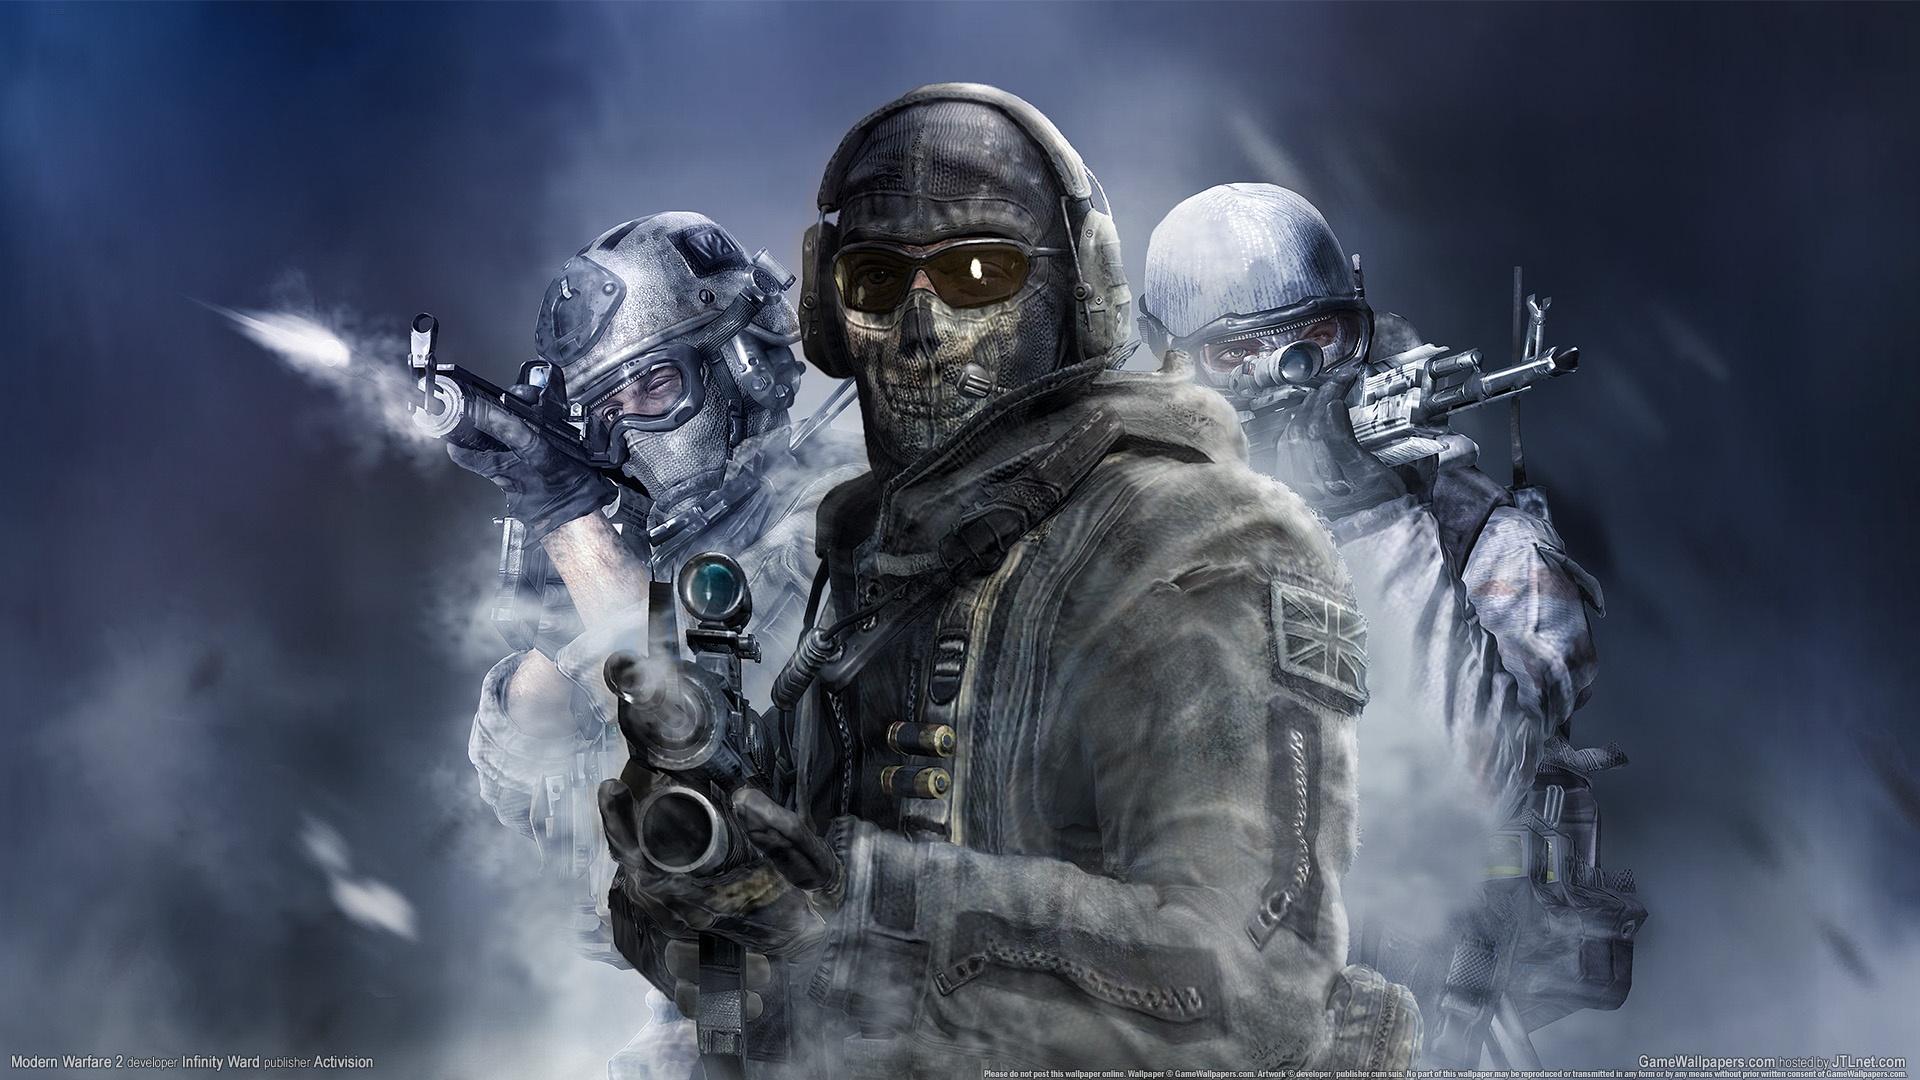 Girls Typography Iphone Wallpaper Call Of Duty Modern Warfare 2 Quot Ghost Quot 2 Hd Wallpaper